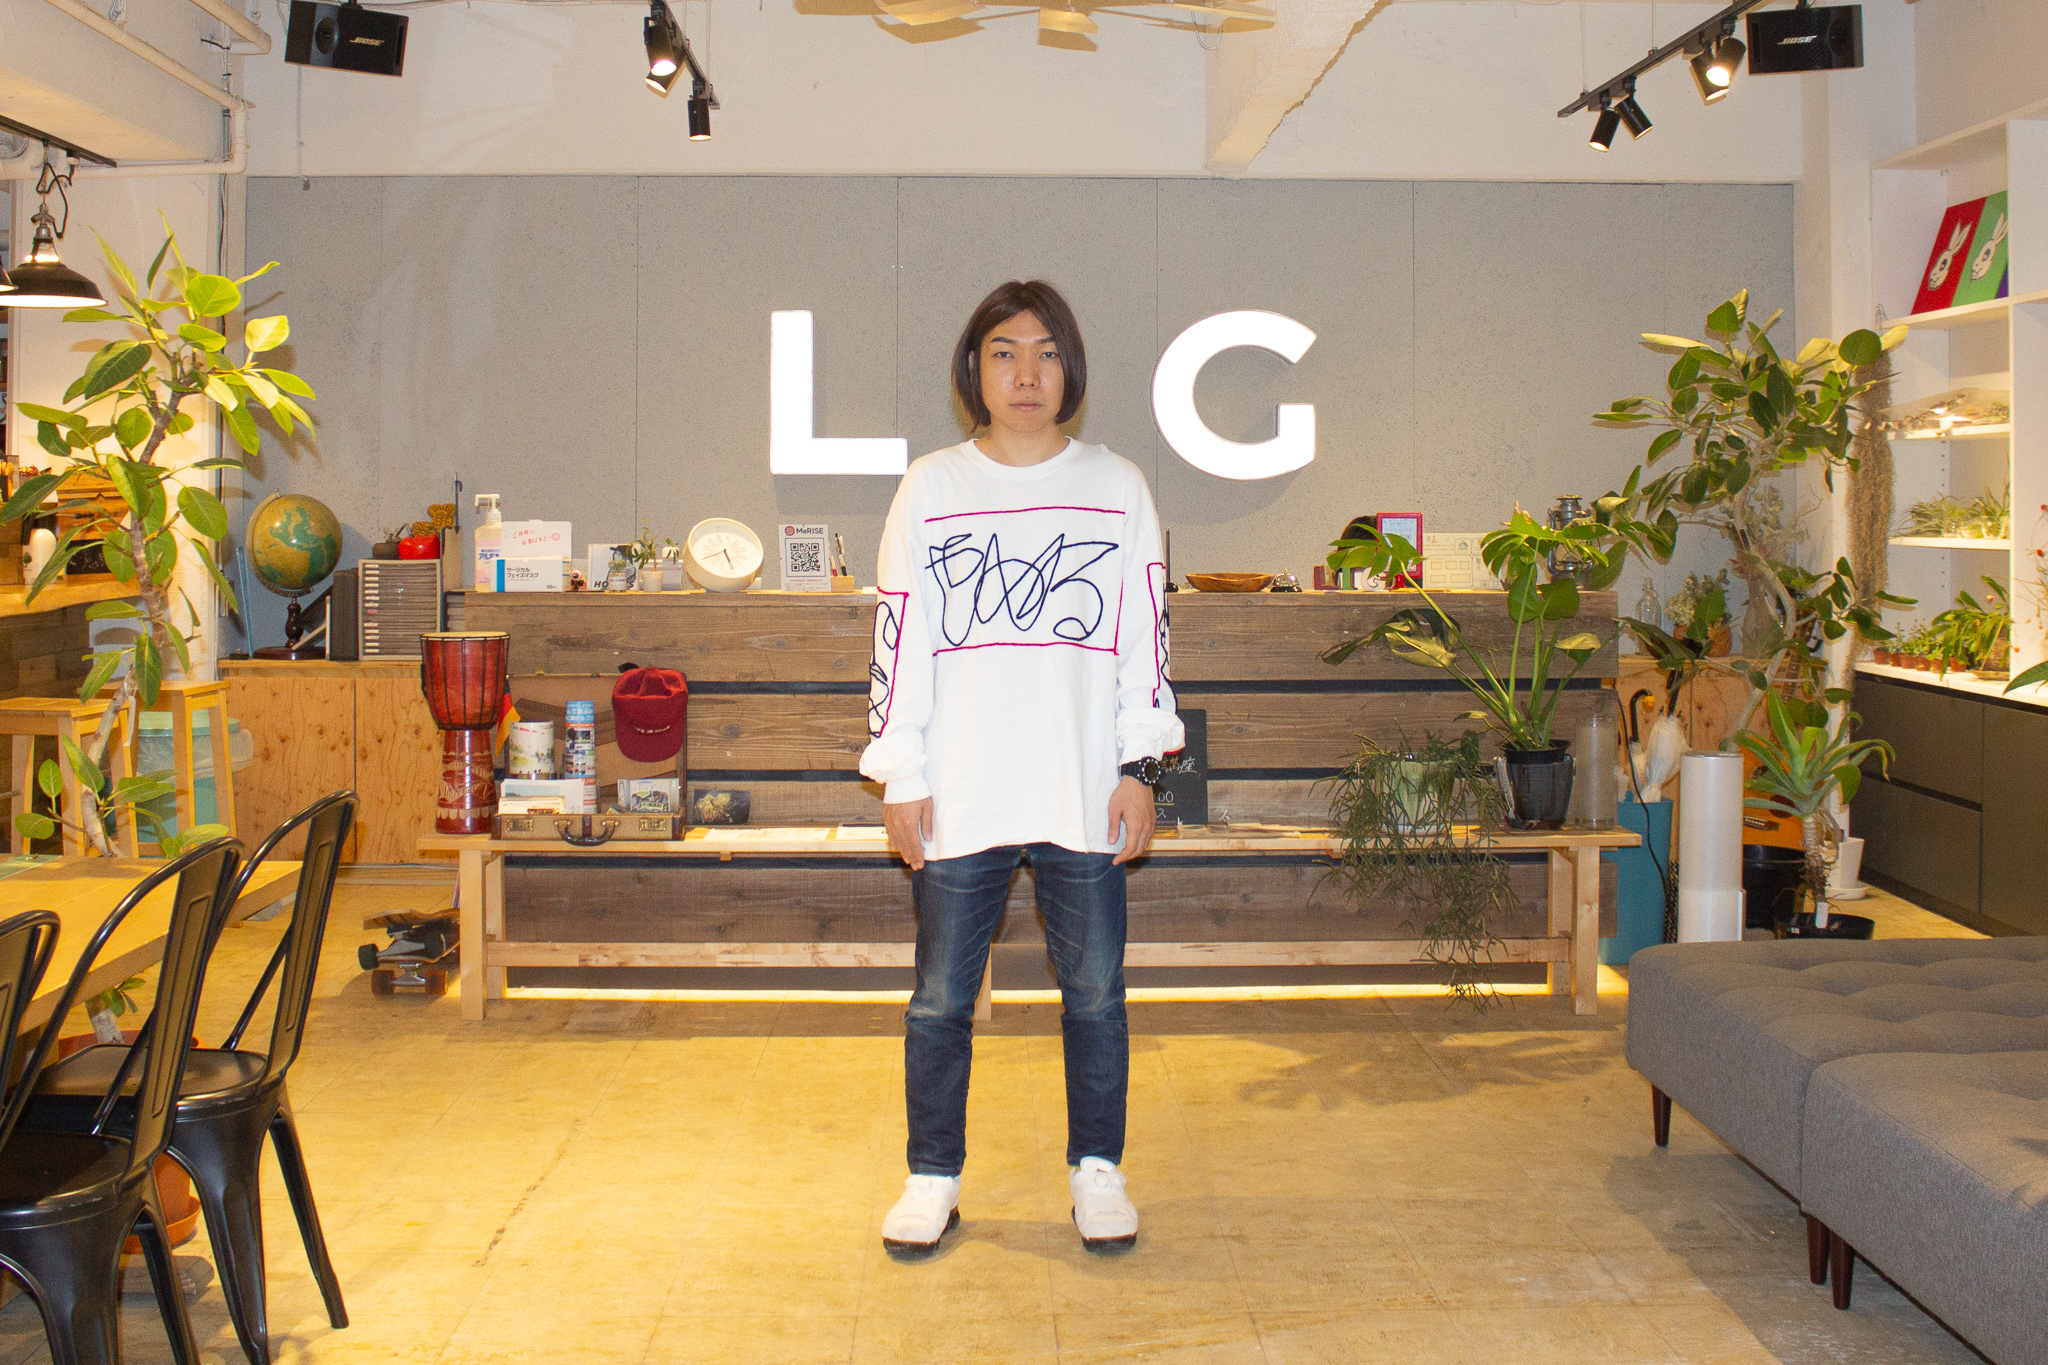 LIG新御徒町オフィスに佇む菊池良さん